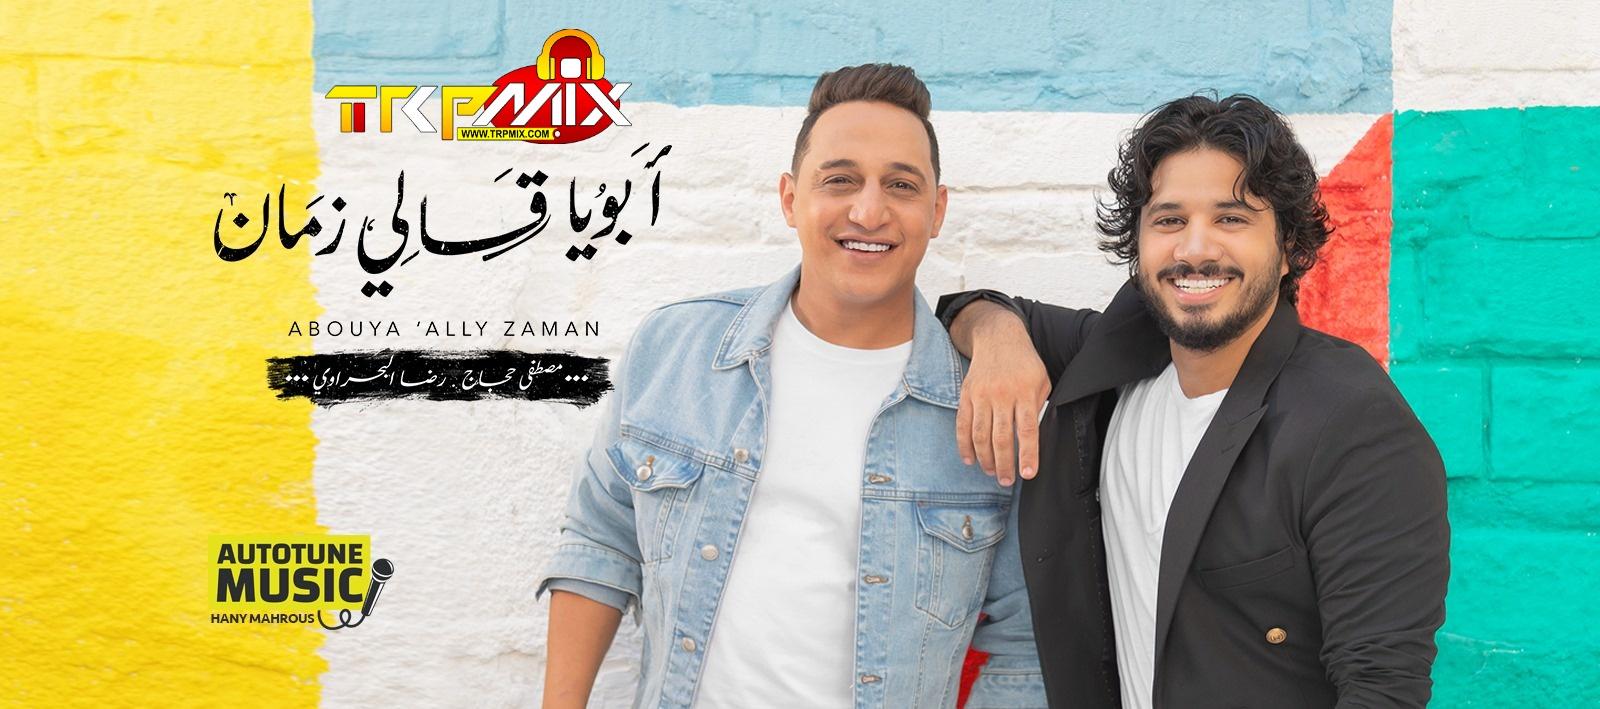 مصطفى حجاج - رضا البحراوي | ابويا قالي زمان - Moustafa Hagag - Reda El Bahrawy | Abouya Ally Zaman